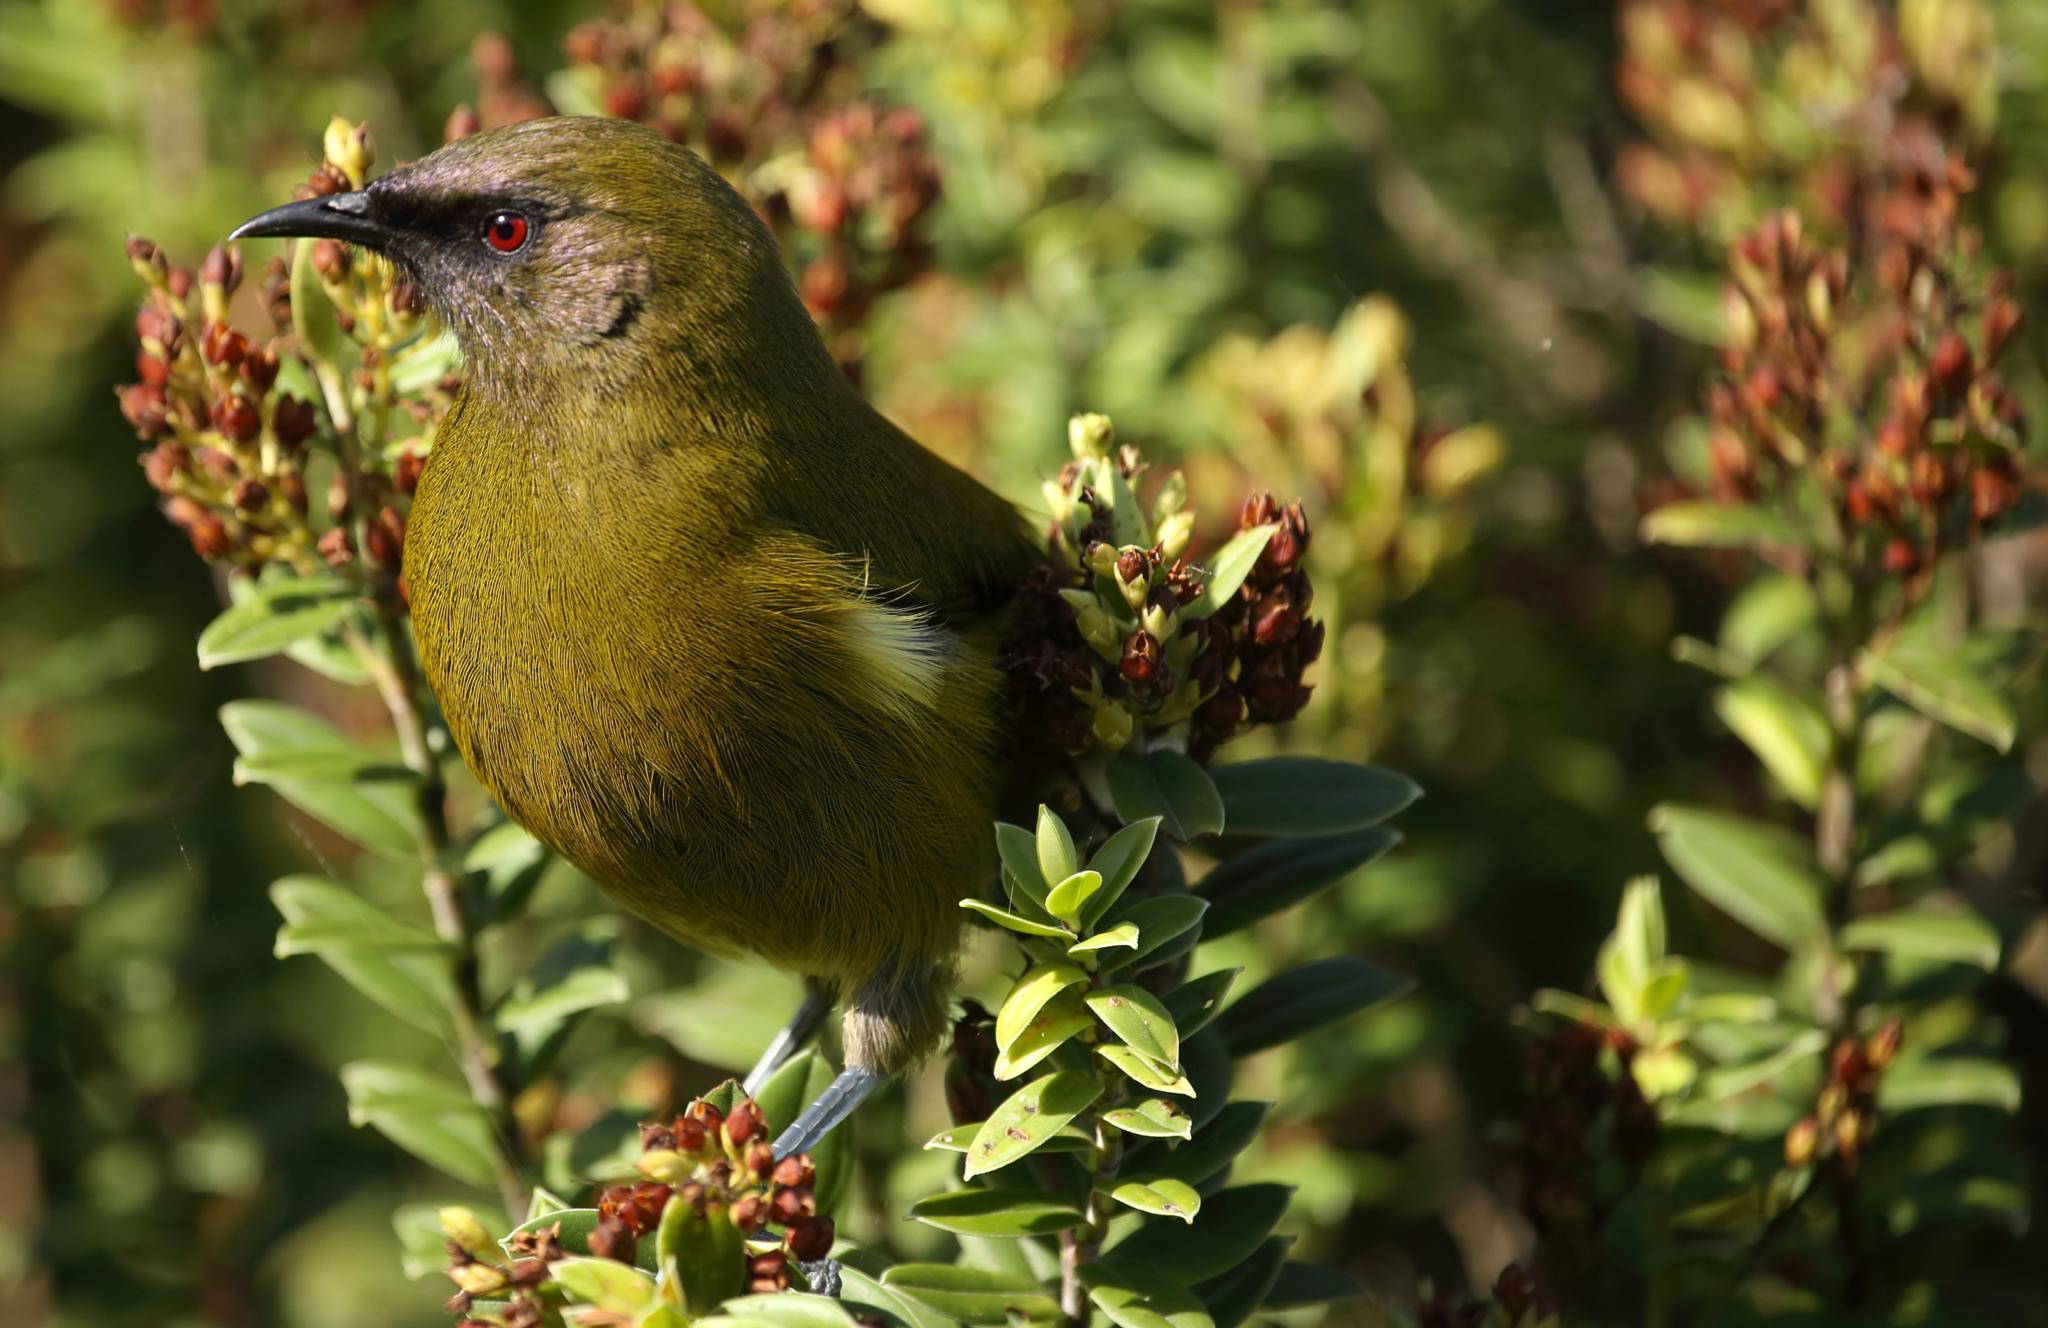 Bell Bird by Greig Howell